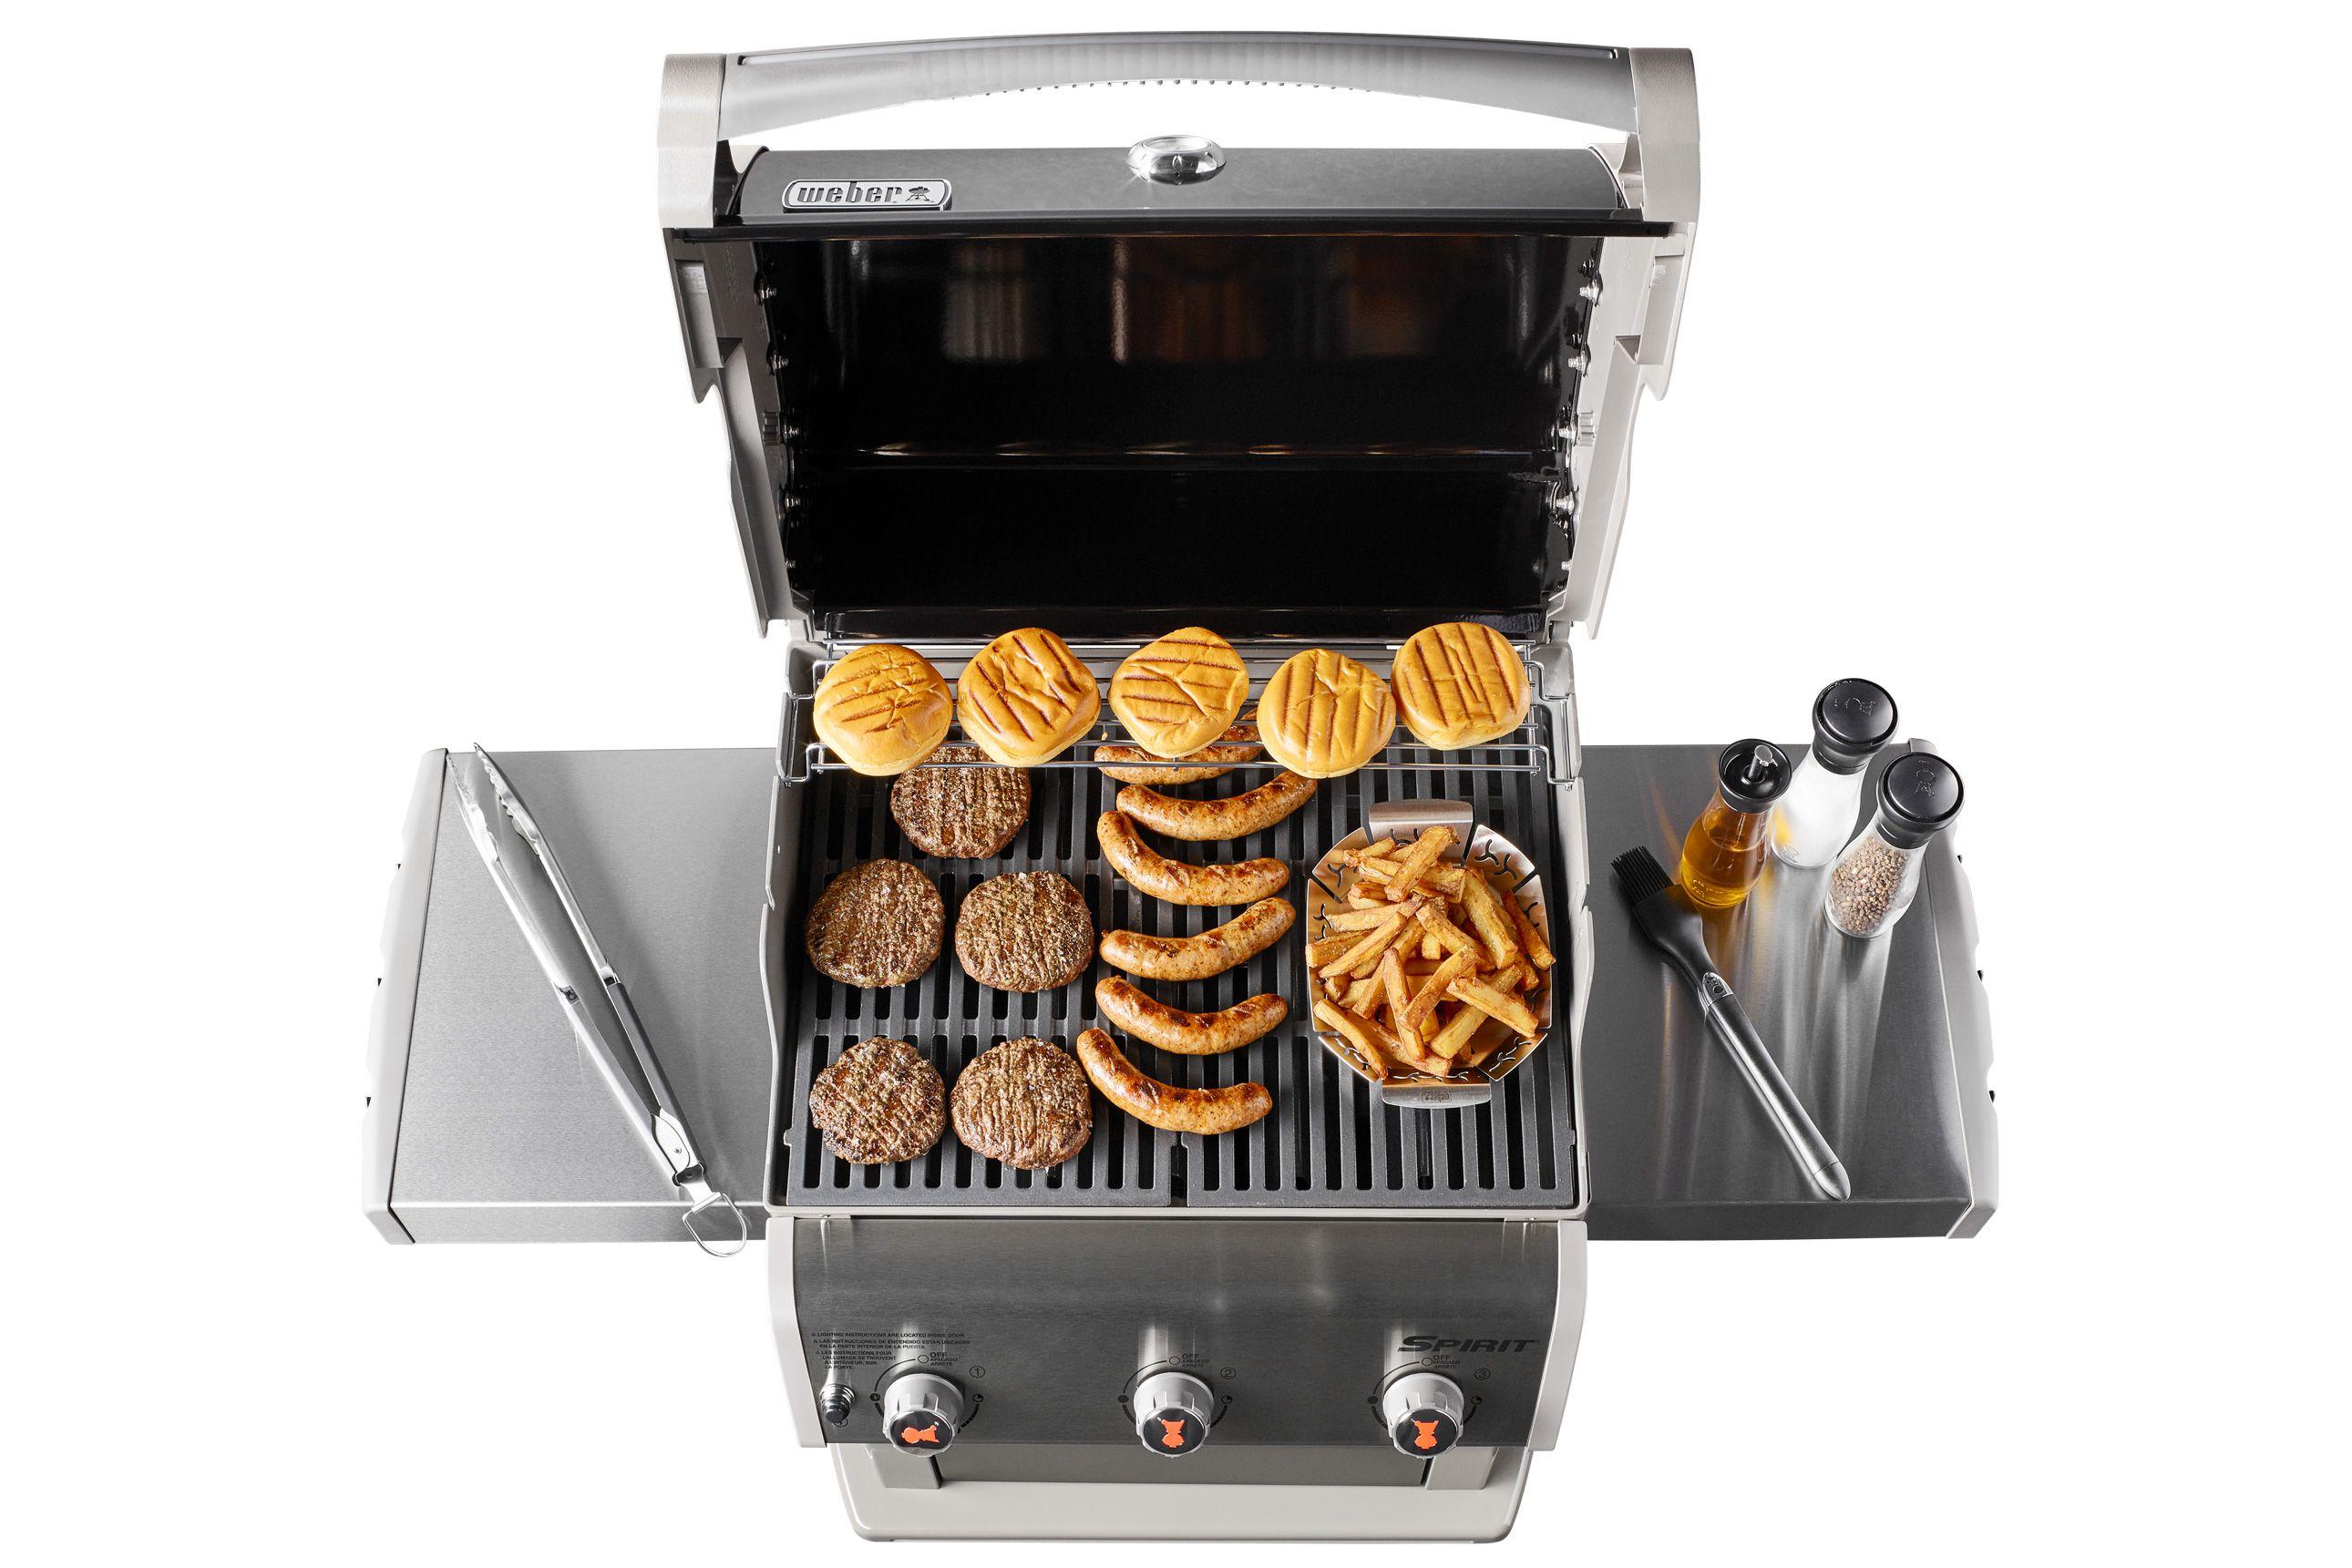 weber spirit e 310 gourmet bbq system gas grill review. Black Bedroom Furniture Sets. Home Design Ideas